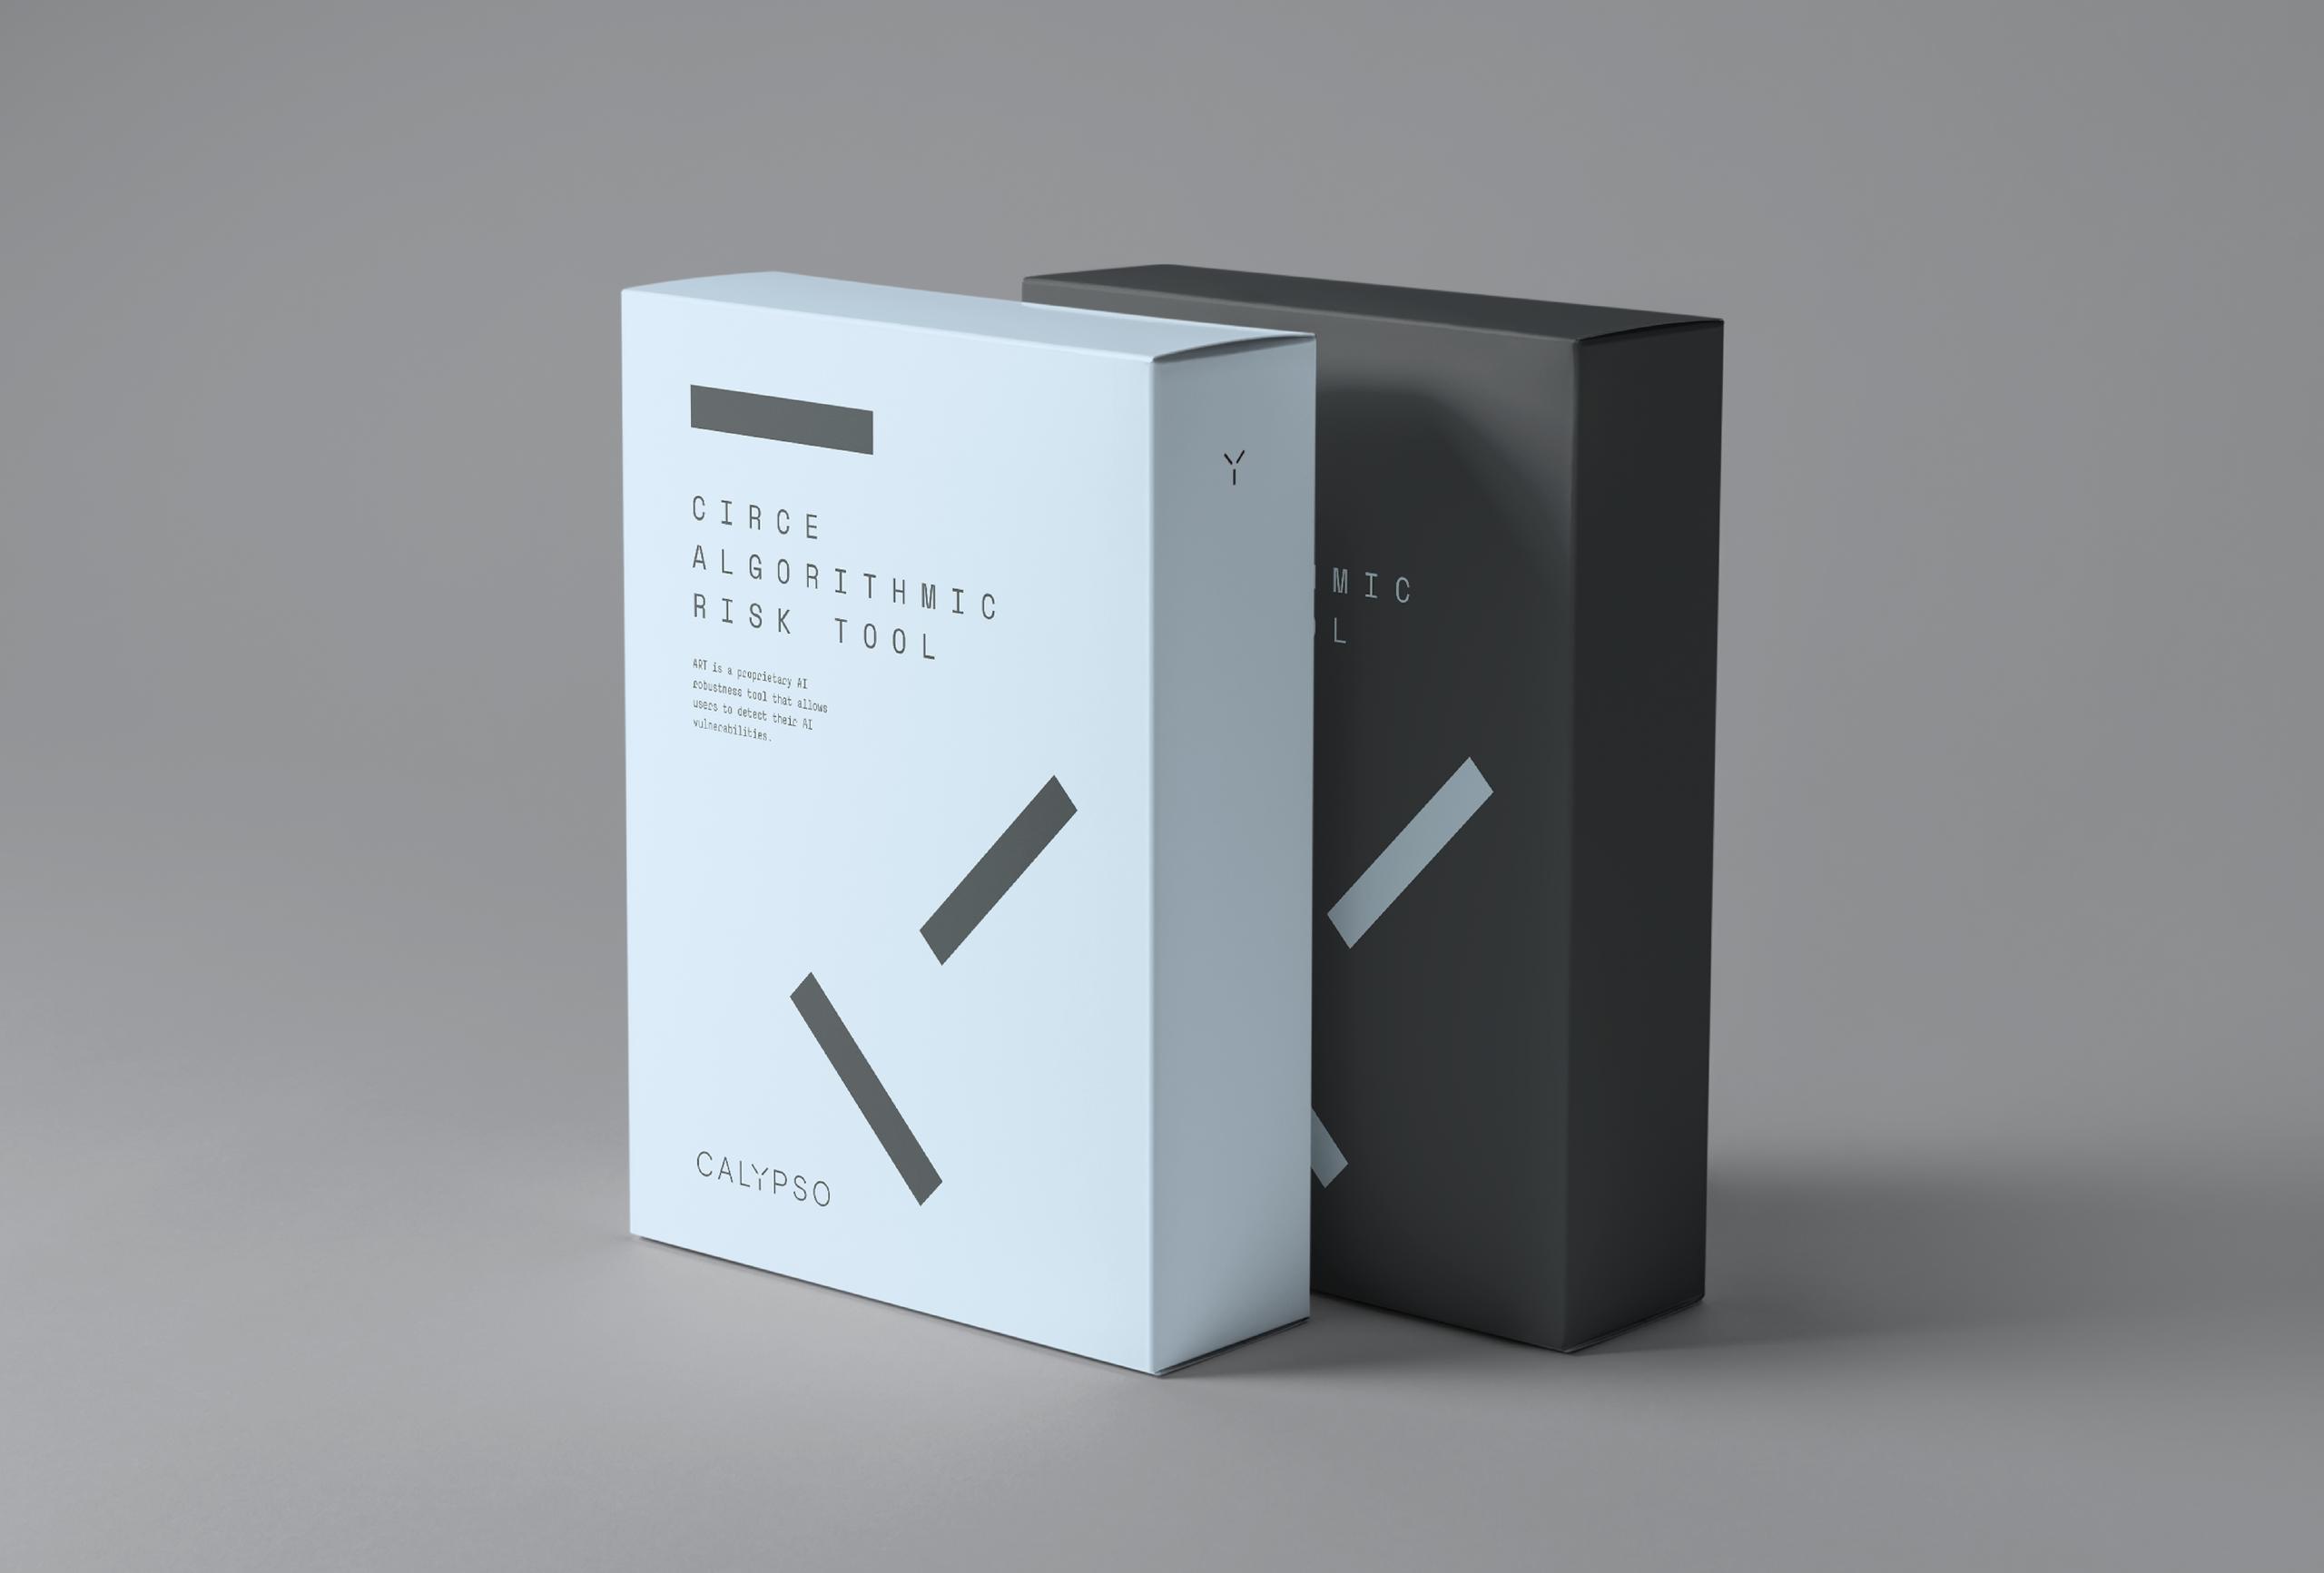 fagerström | Calypso | Visual Identity